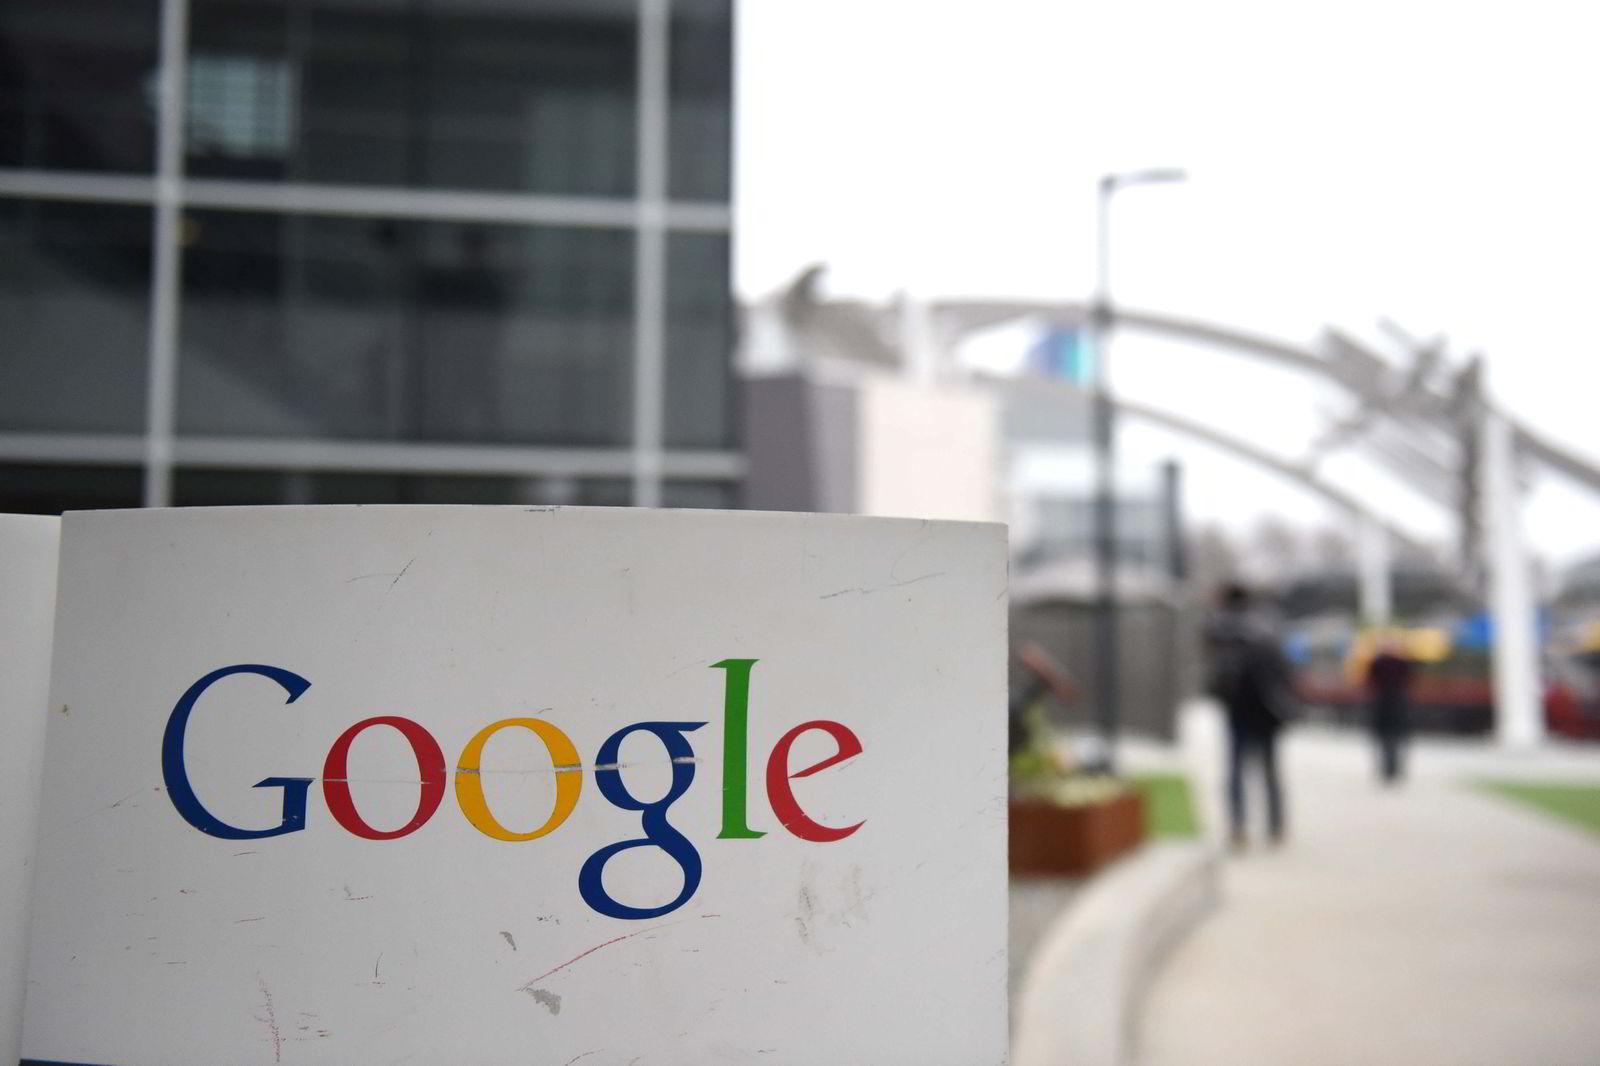 Googles logo utenfor hovedkvarteret i Mountain View, California. AFP PHOTO / SUSANA BATES